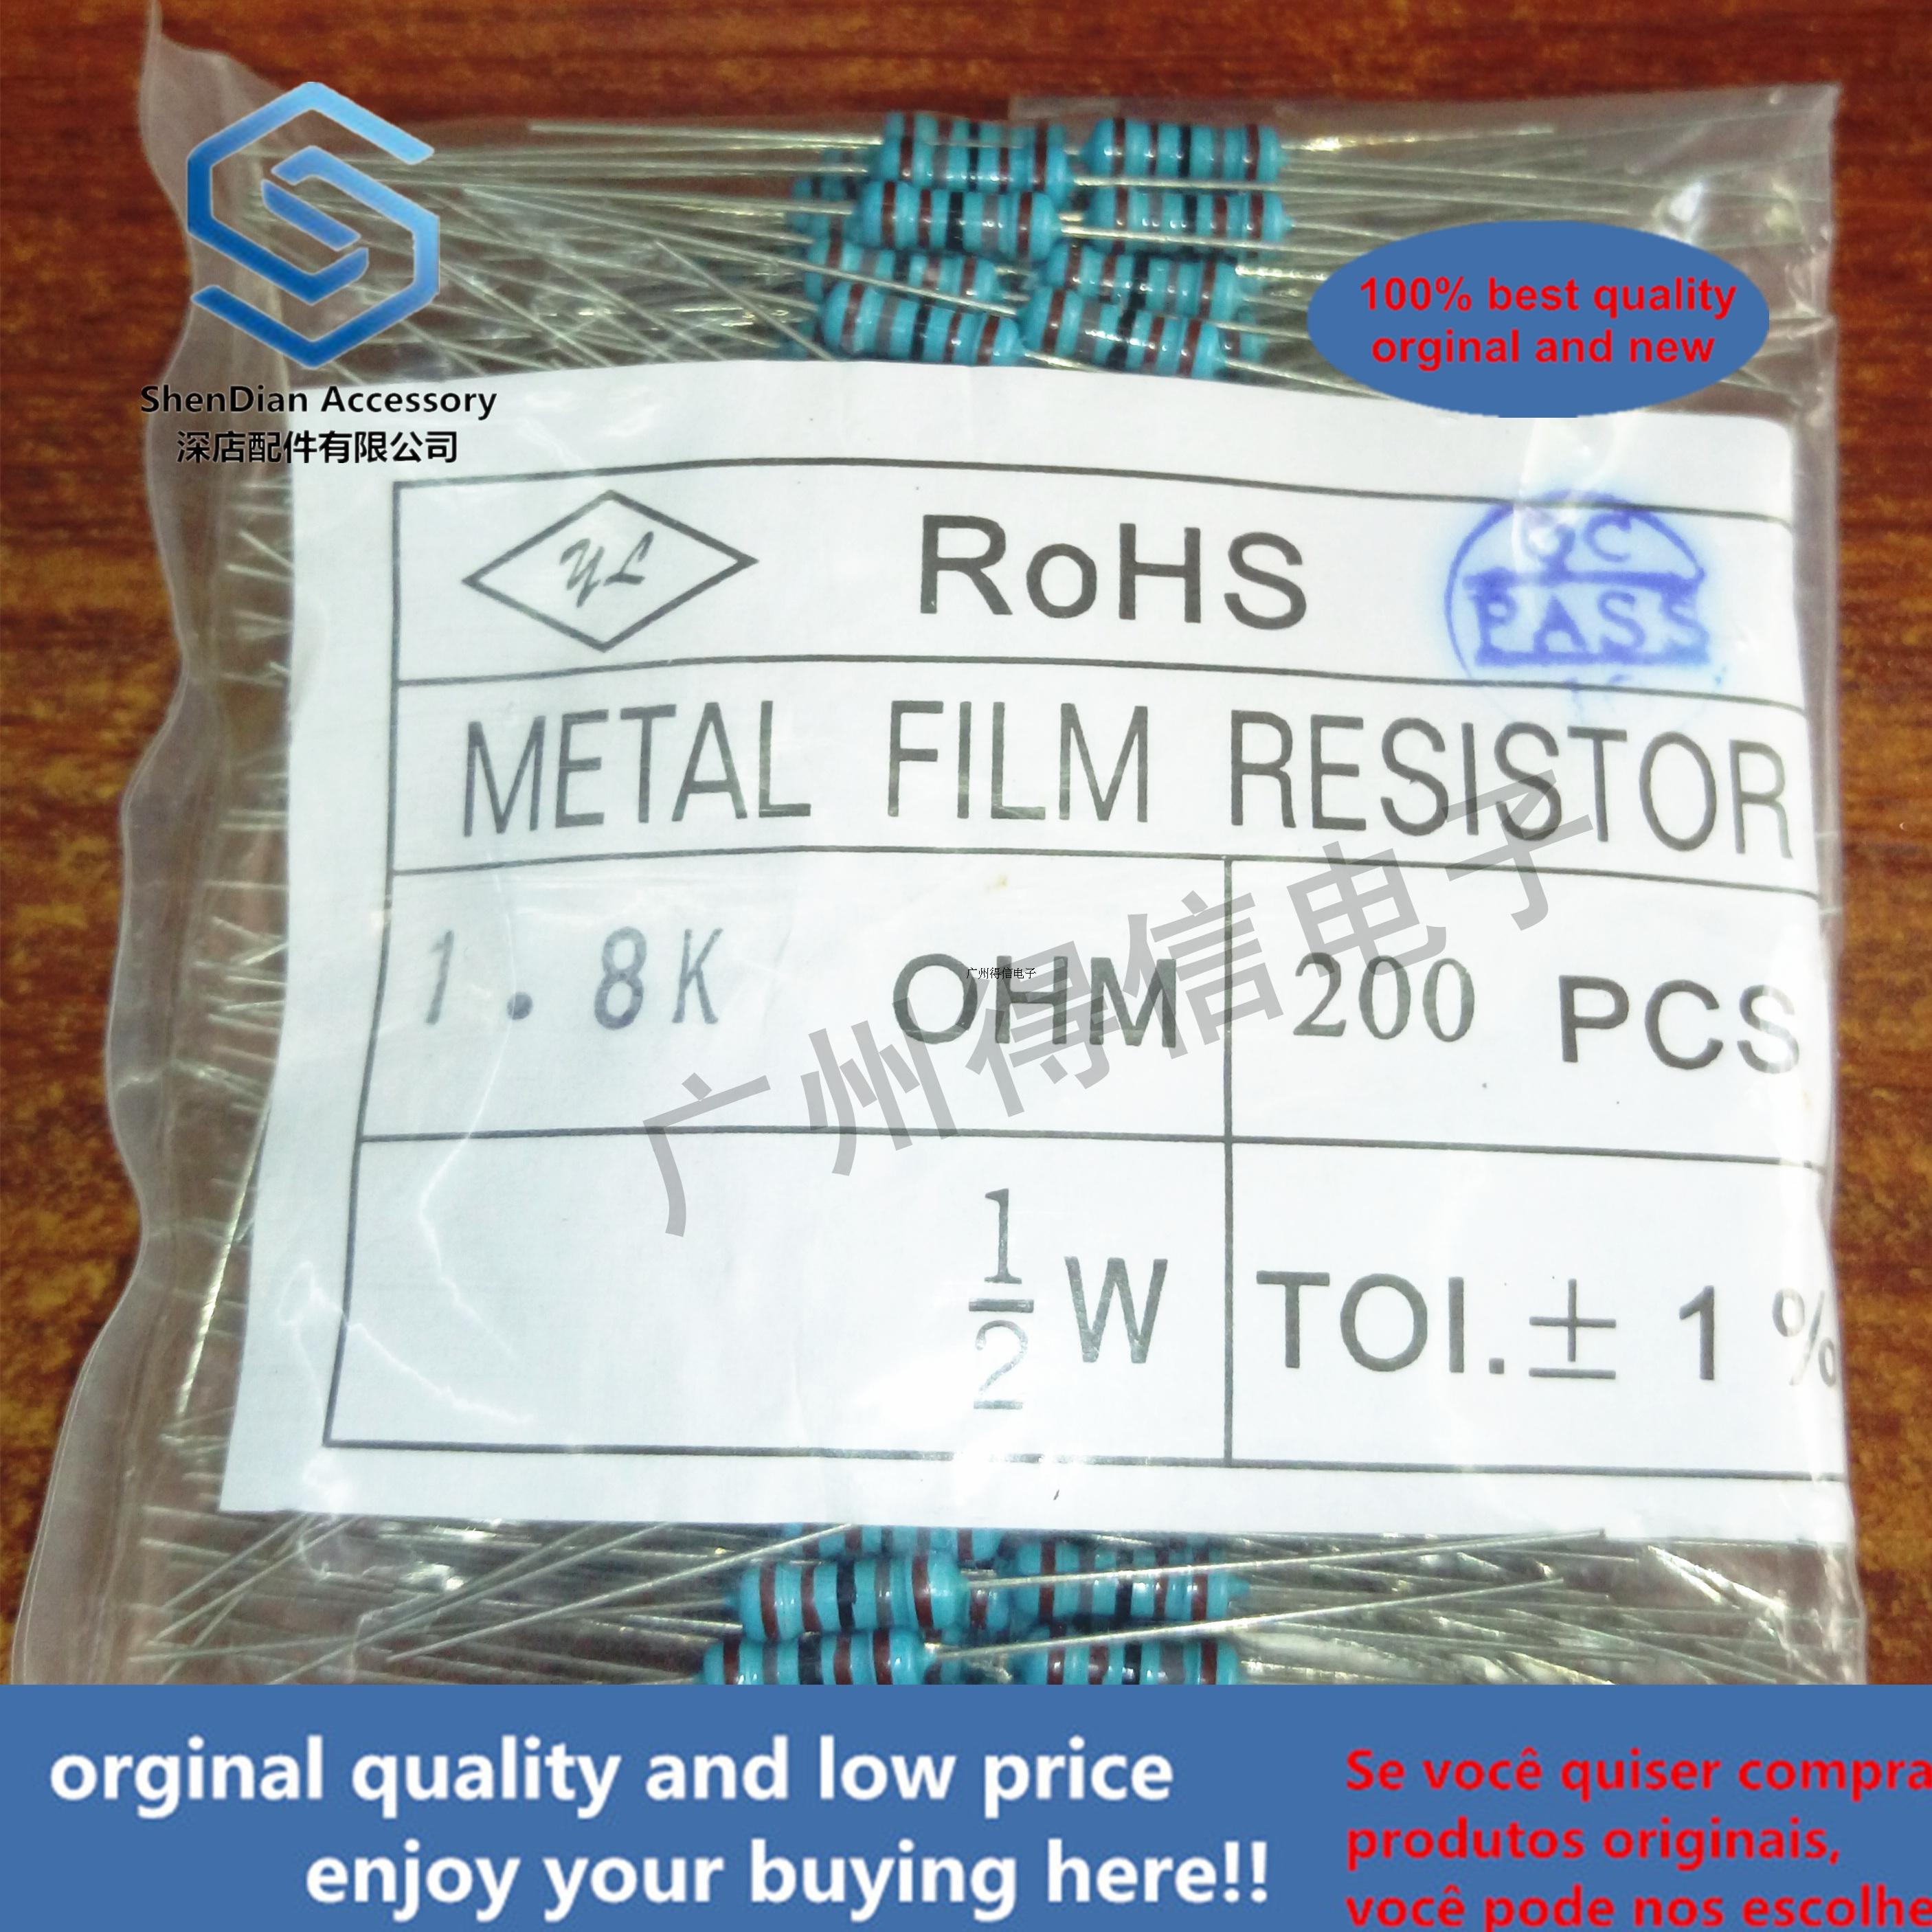 200pcs 1 / 2W 620R 620 Euro 1% Brand New Metal Film Iron Feet Resistor Bag 200 Pcs Per Pack